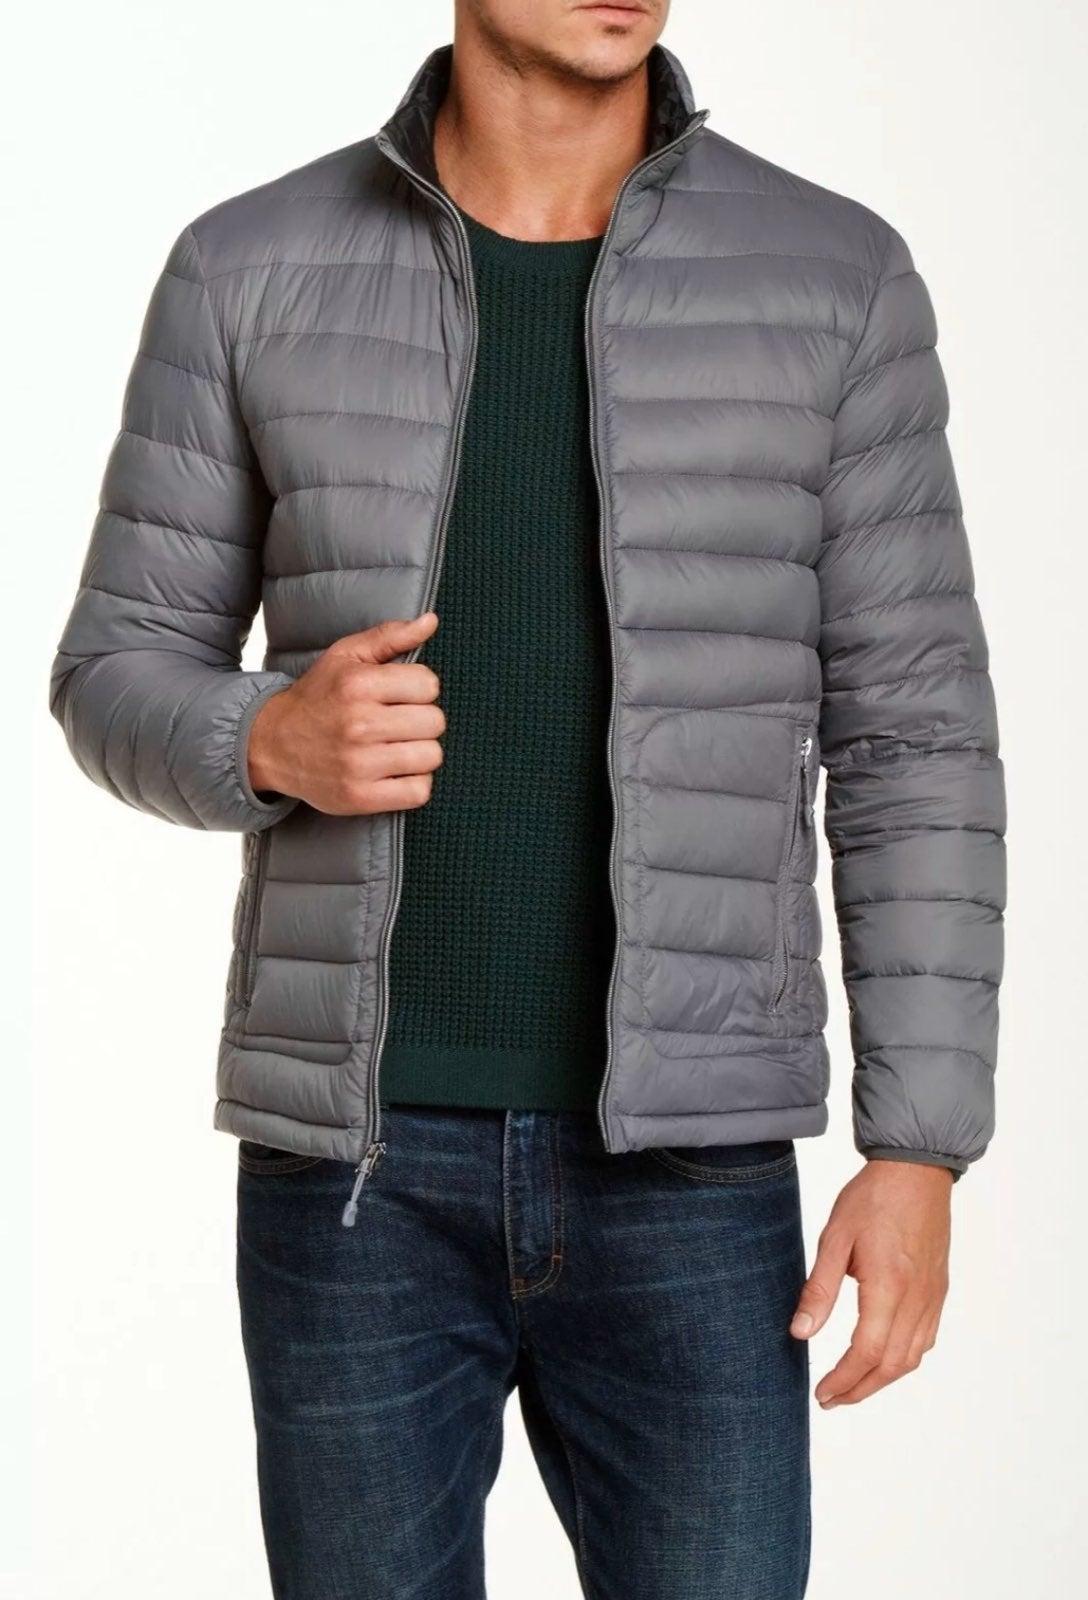 Buffalo Men's Packable Down Jacket Sz XL